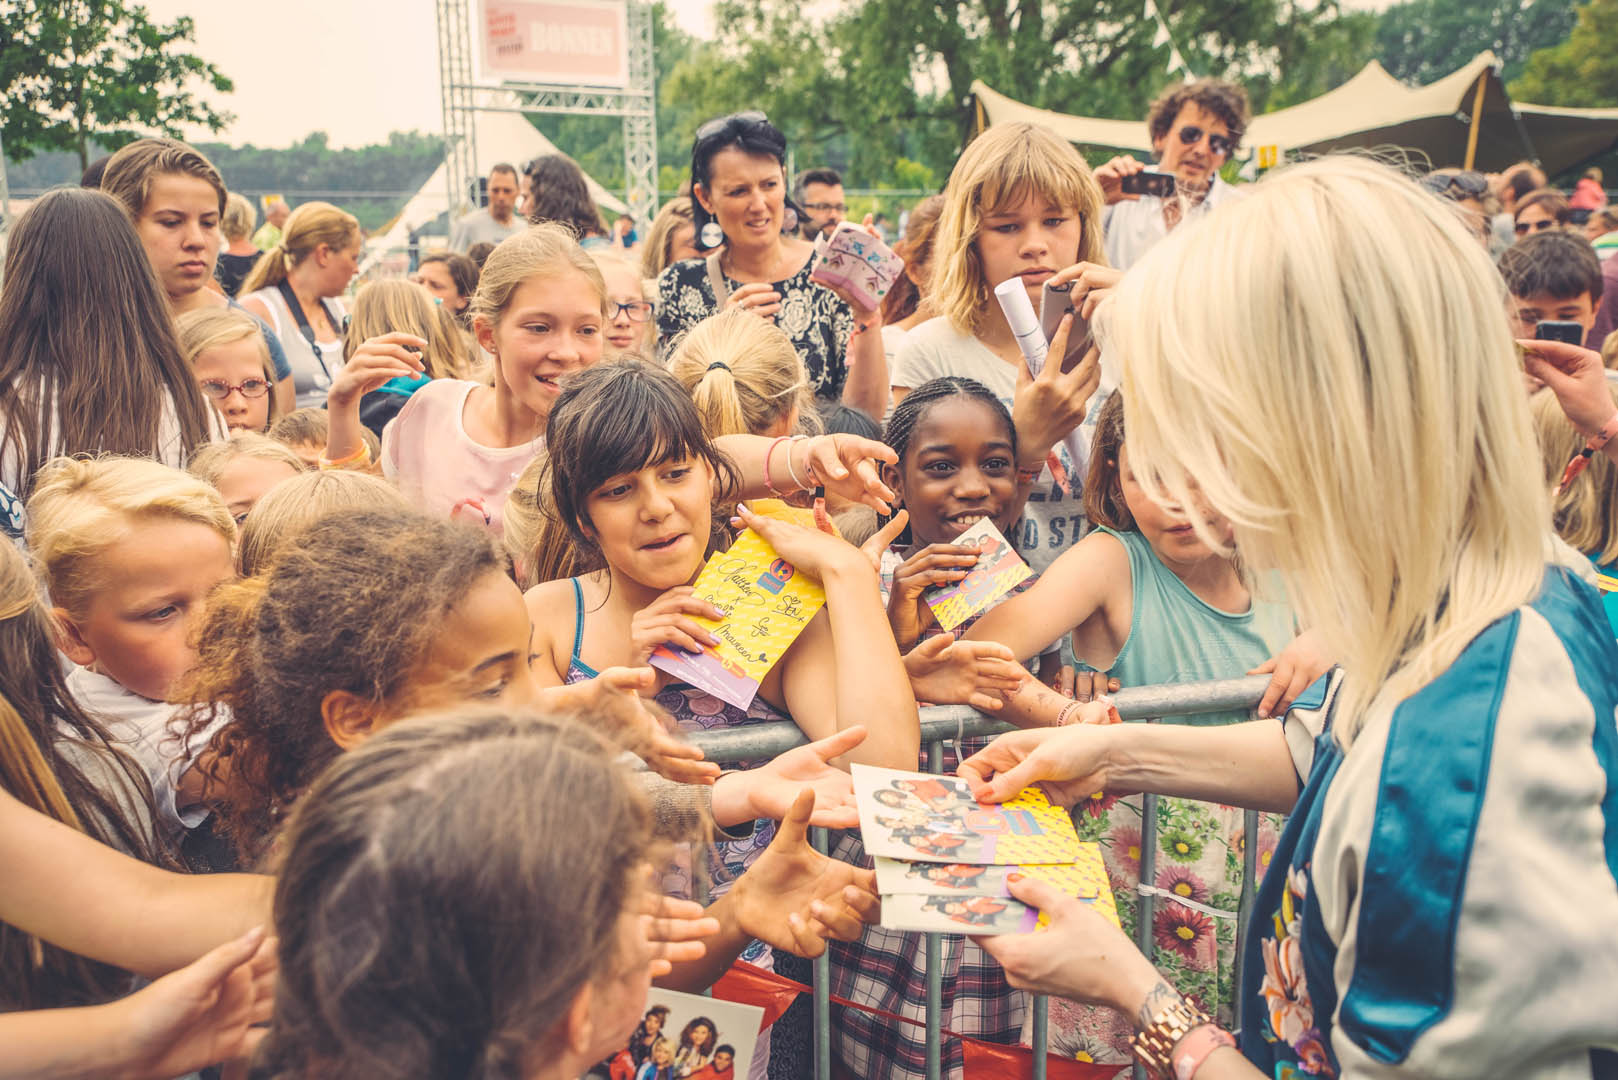 Stad Gent Picknick Event Kinderen